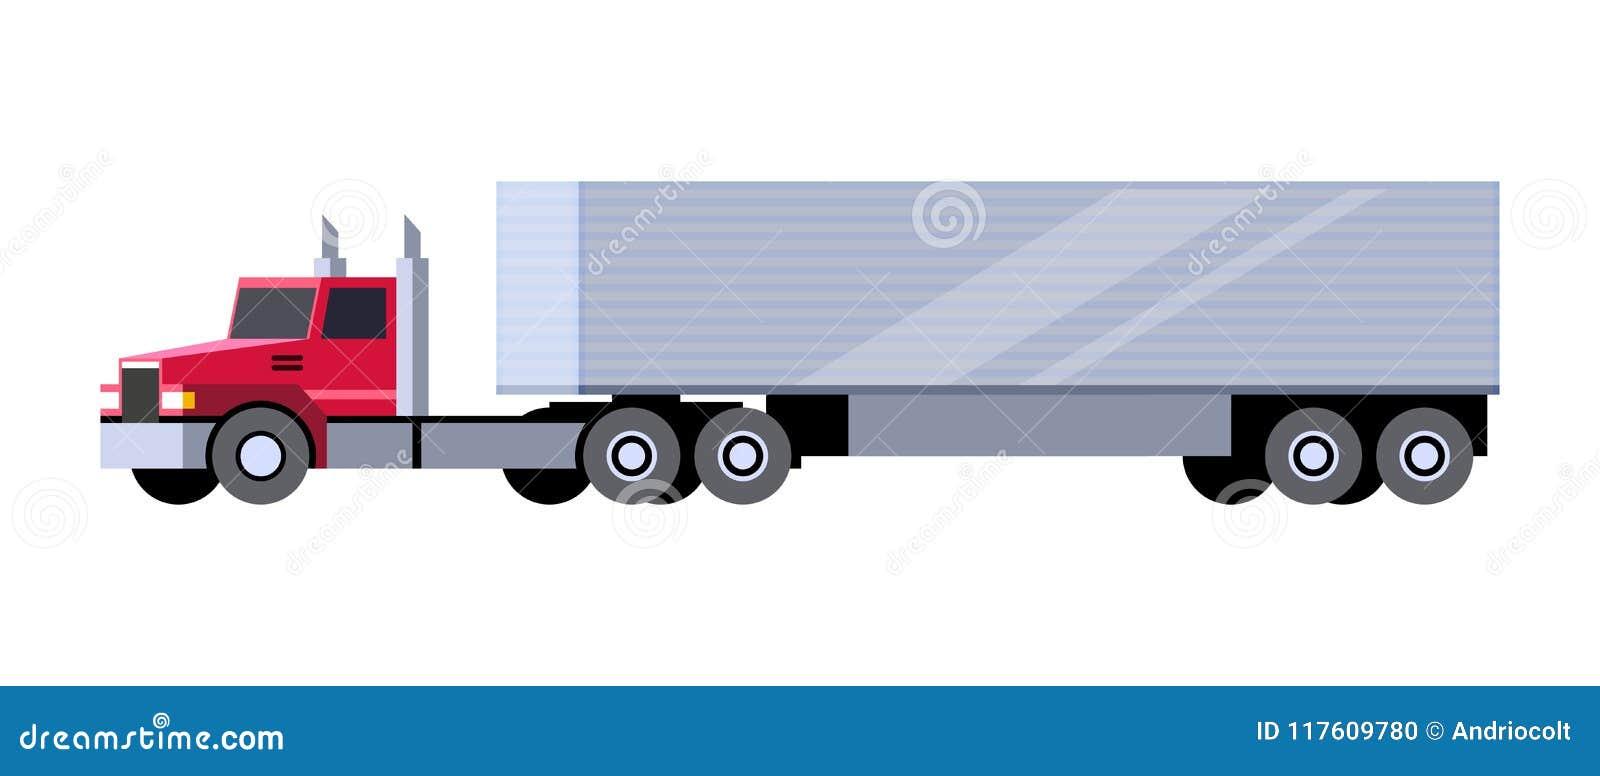 Box trailer truck